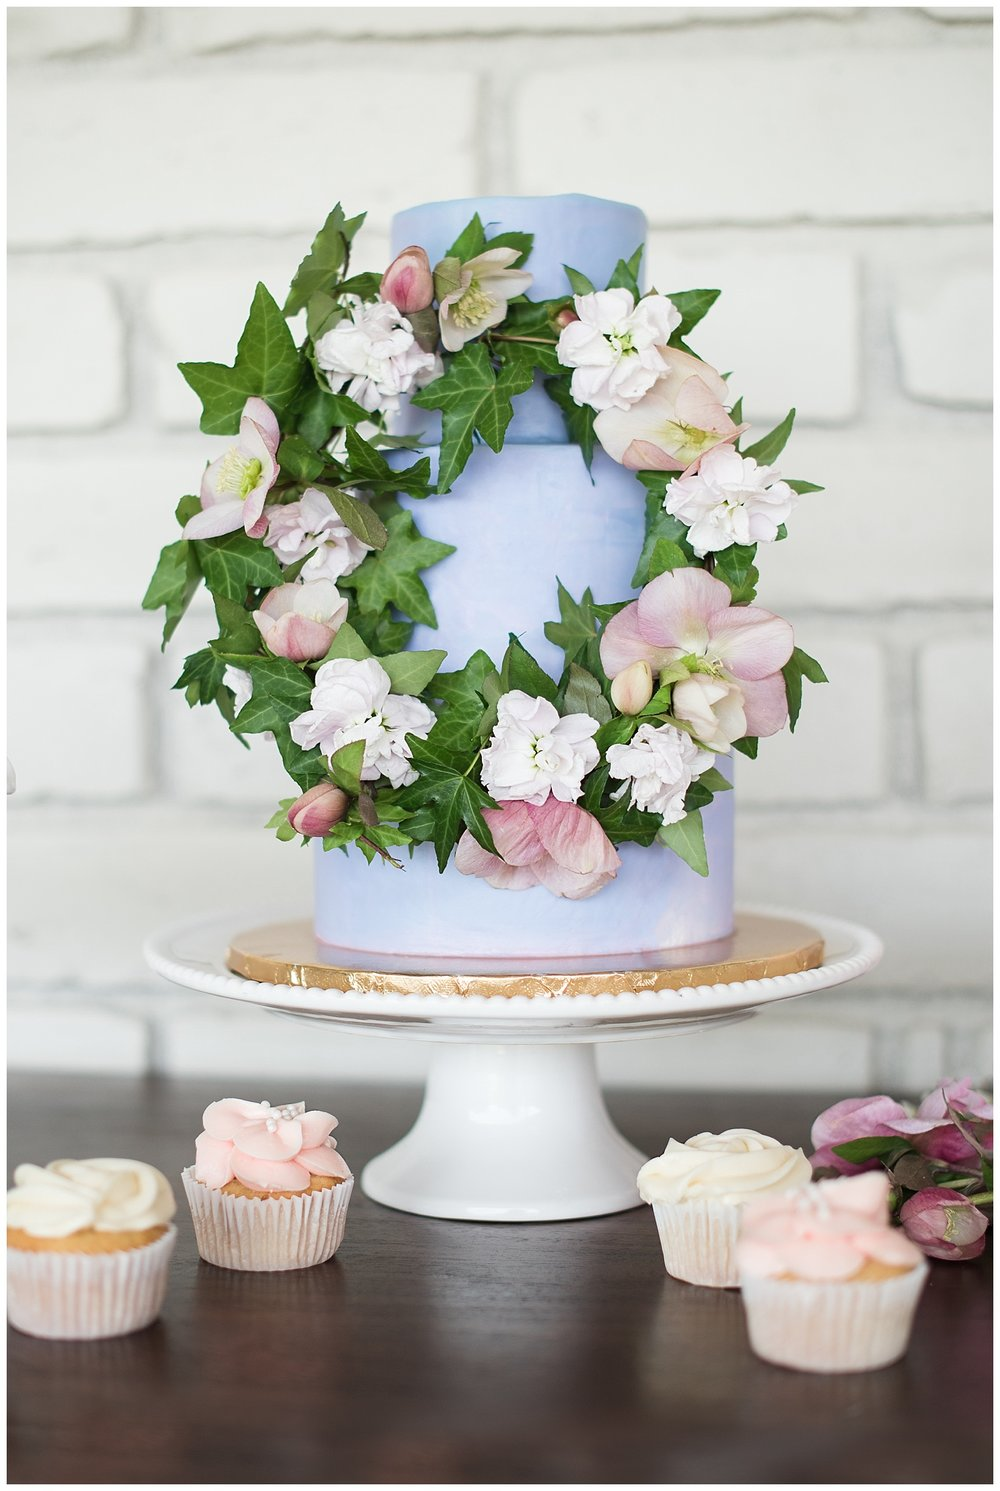 Wedding cake by Sift Bakehouse AZ, photographed at Gather Estate in Mesa, Arizona.